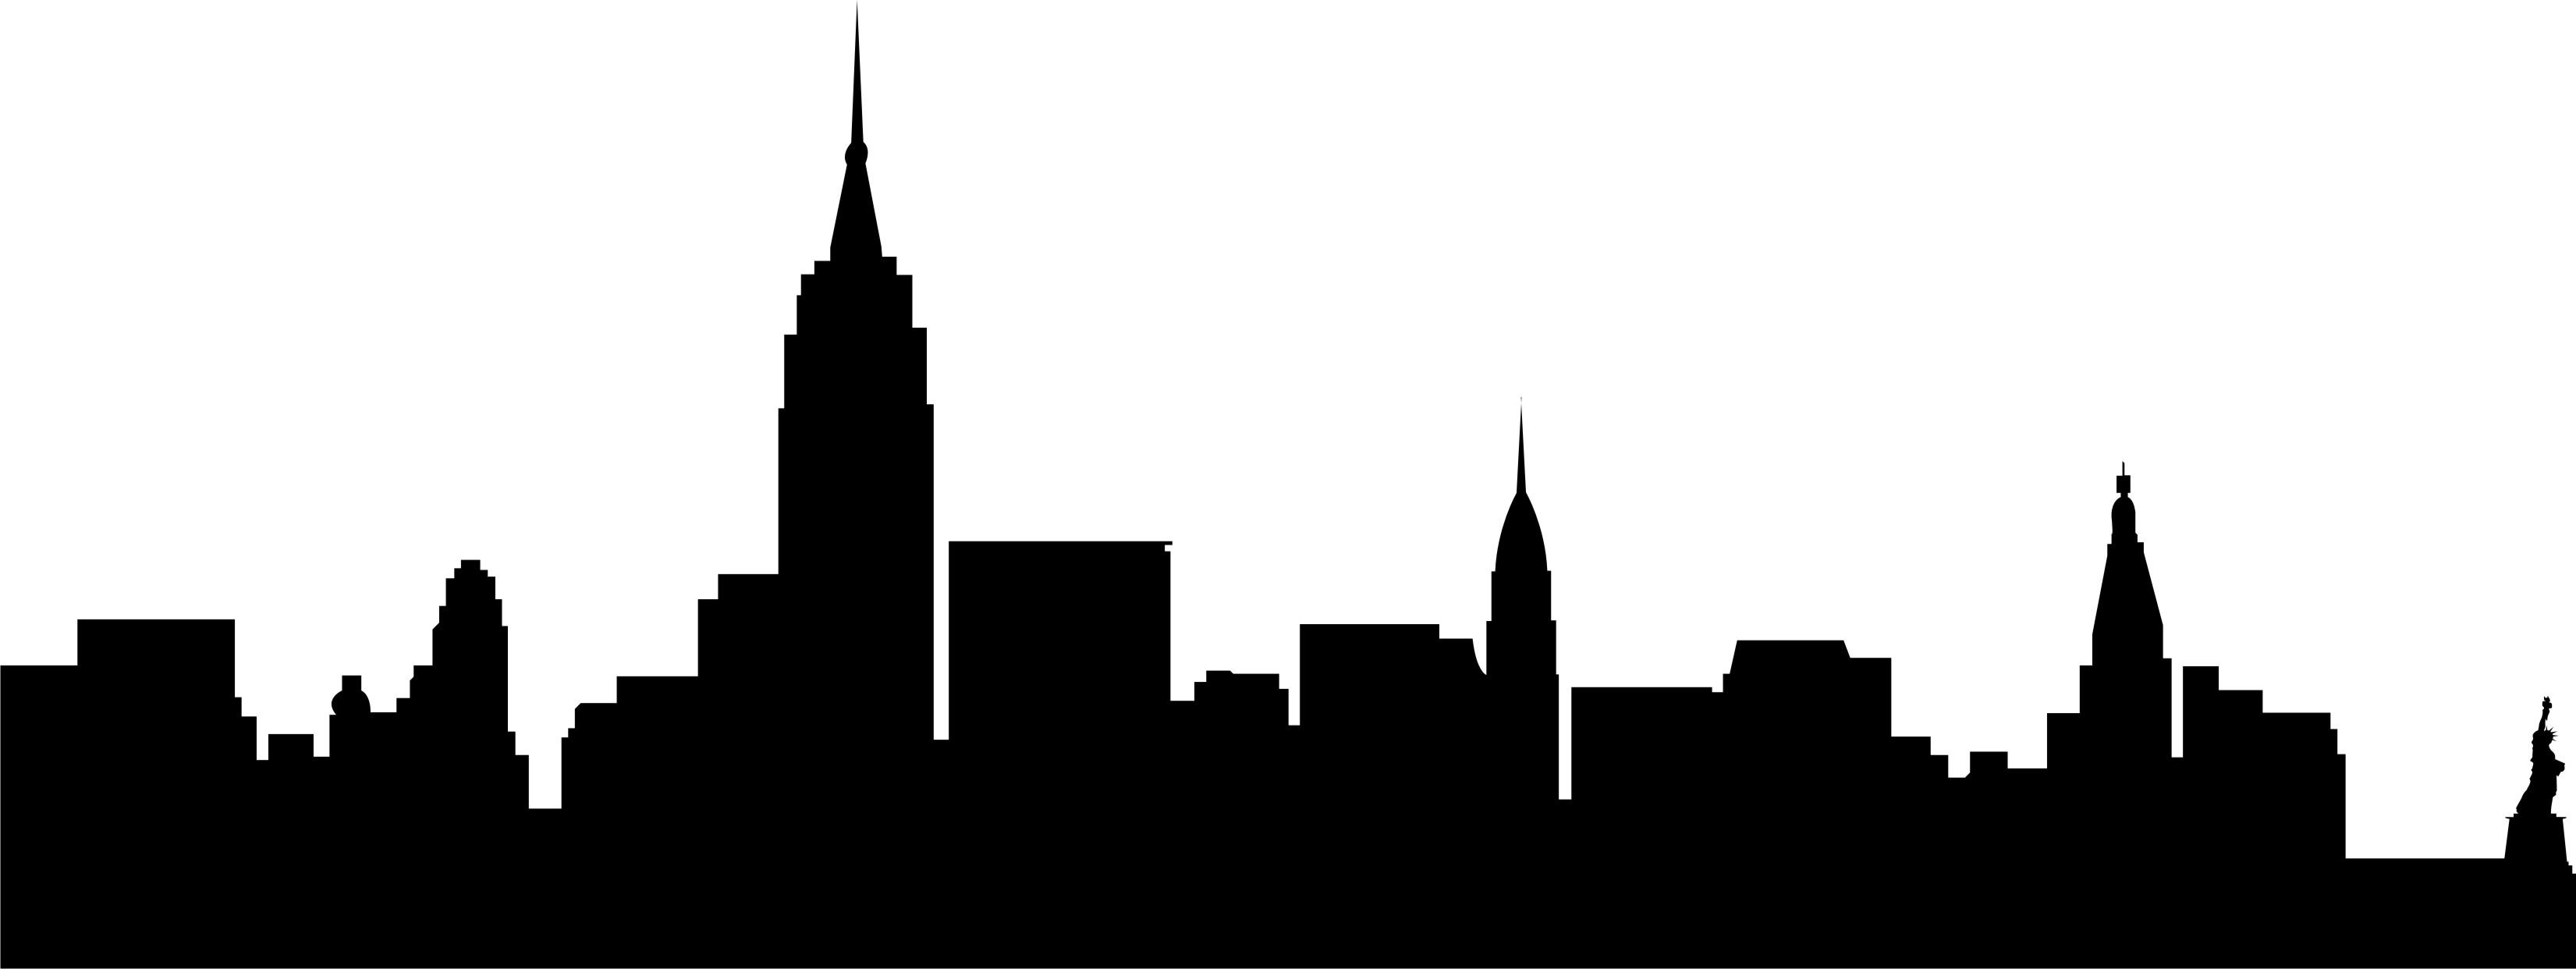 Cityscape city skyline outline clipart